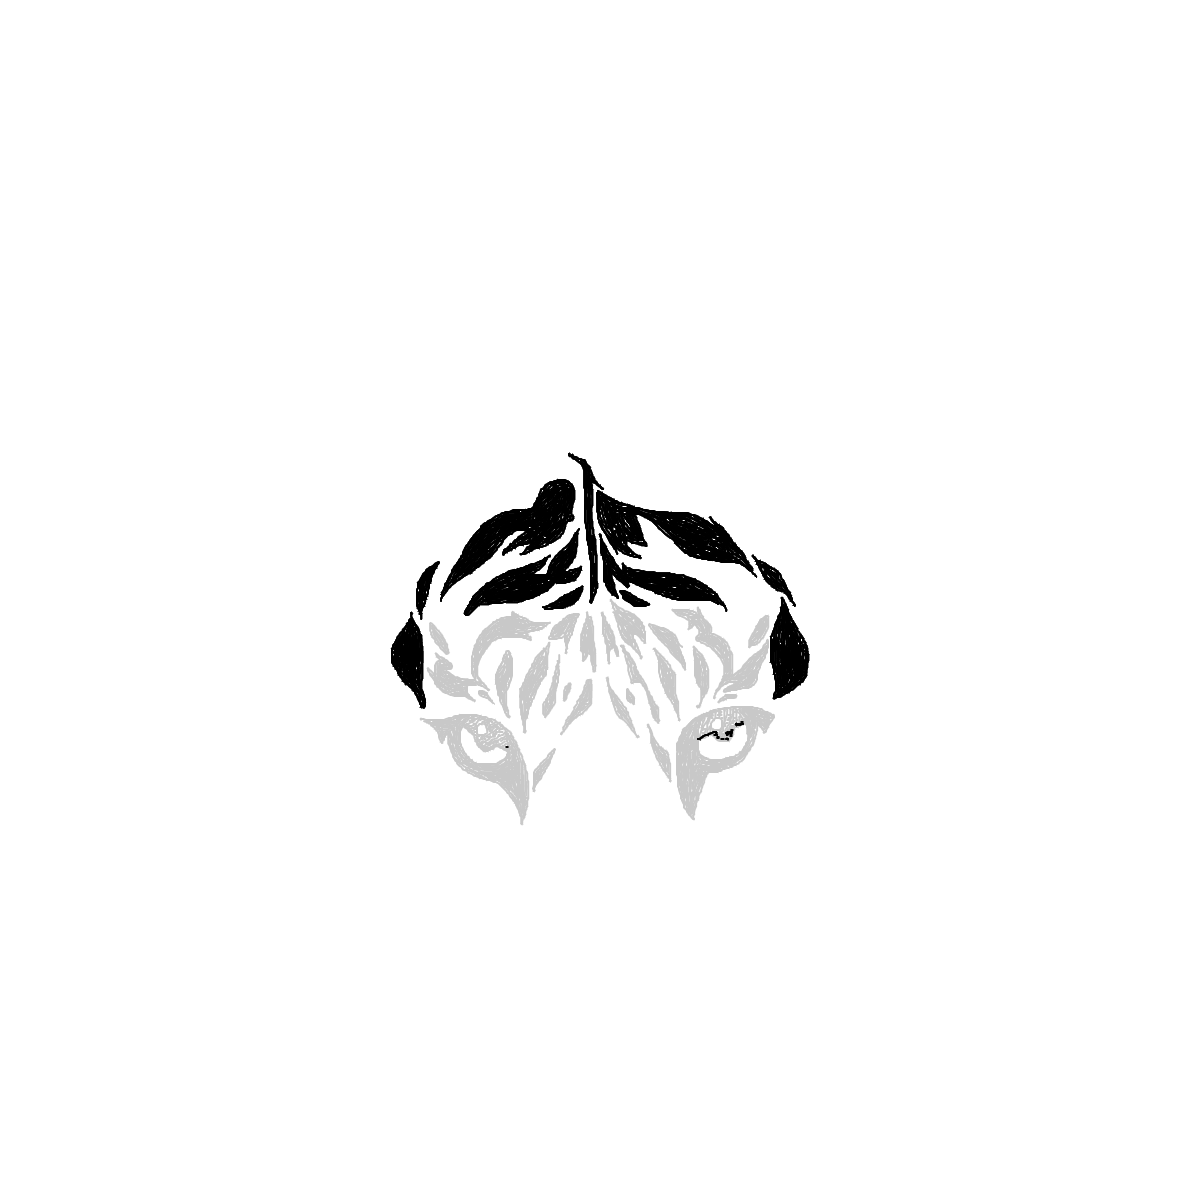 BAAAM drawing#23640 lat:46.1813774108886700lng: 4.7519311904907230